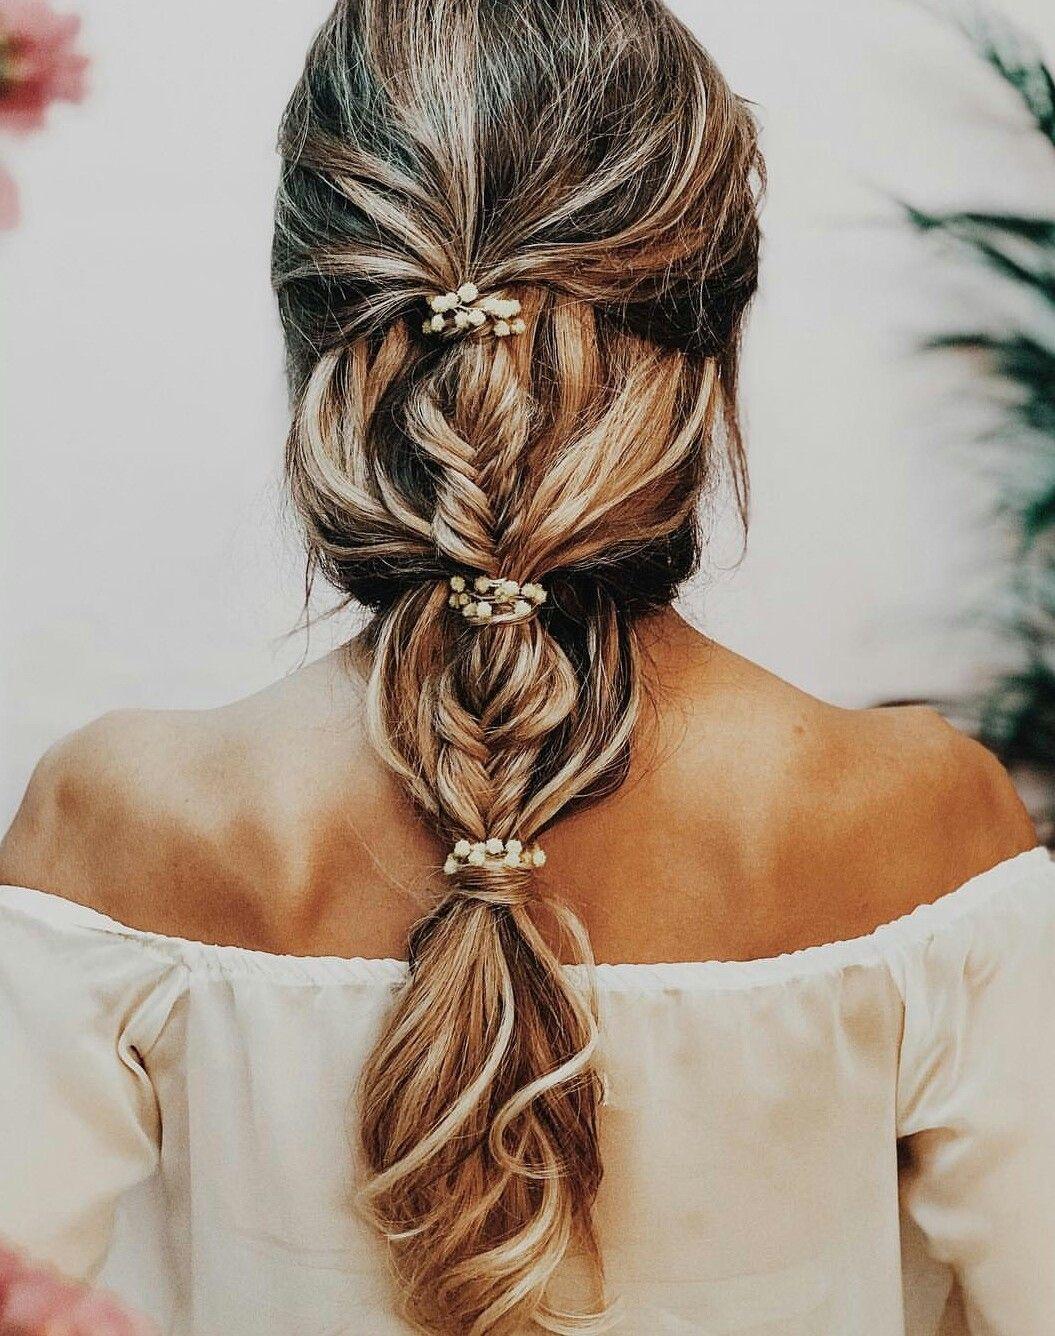 Beautiful Wedding Hair Style Peinados Boda Trenza Peinados Boda Pelo Largo Trenzas Para Bodas